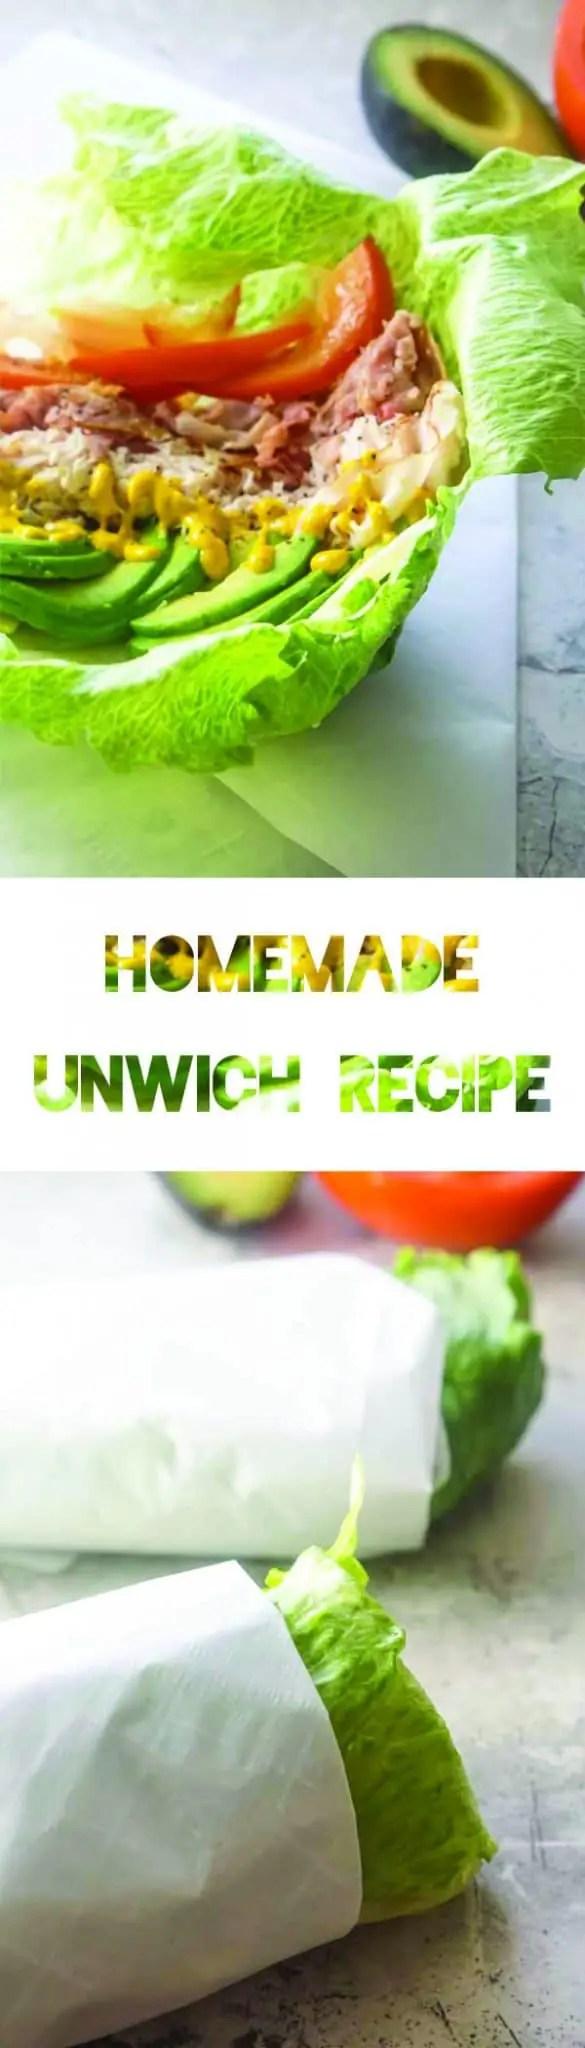 Homemade Unwich Recipe | Keto Diet | Low Carb | Lettuce Wrap | Jimmy John's